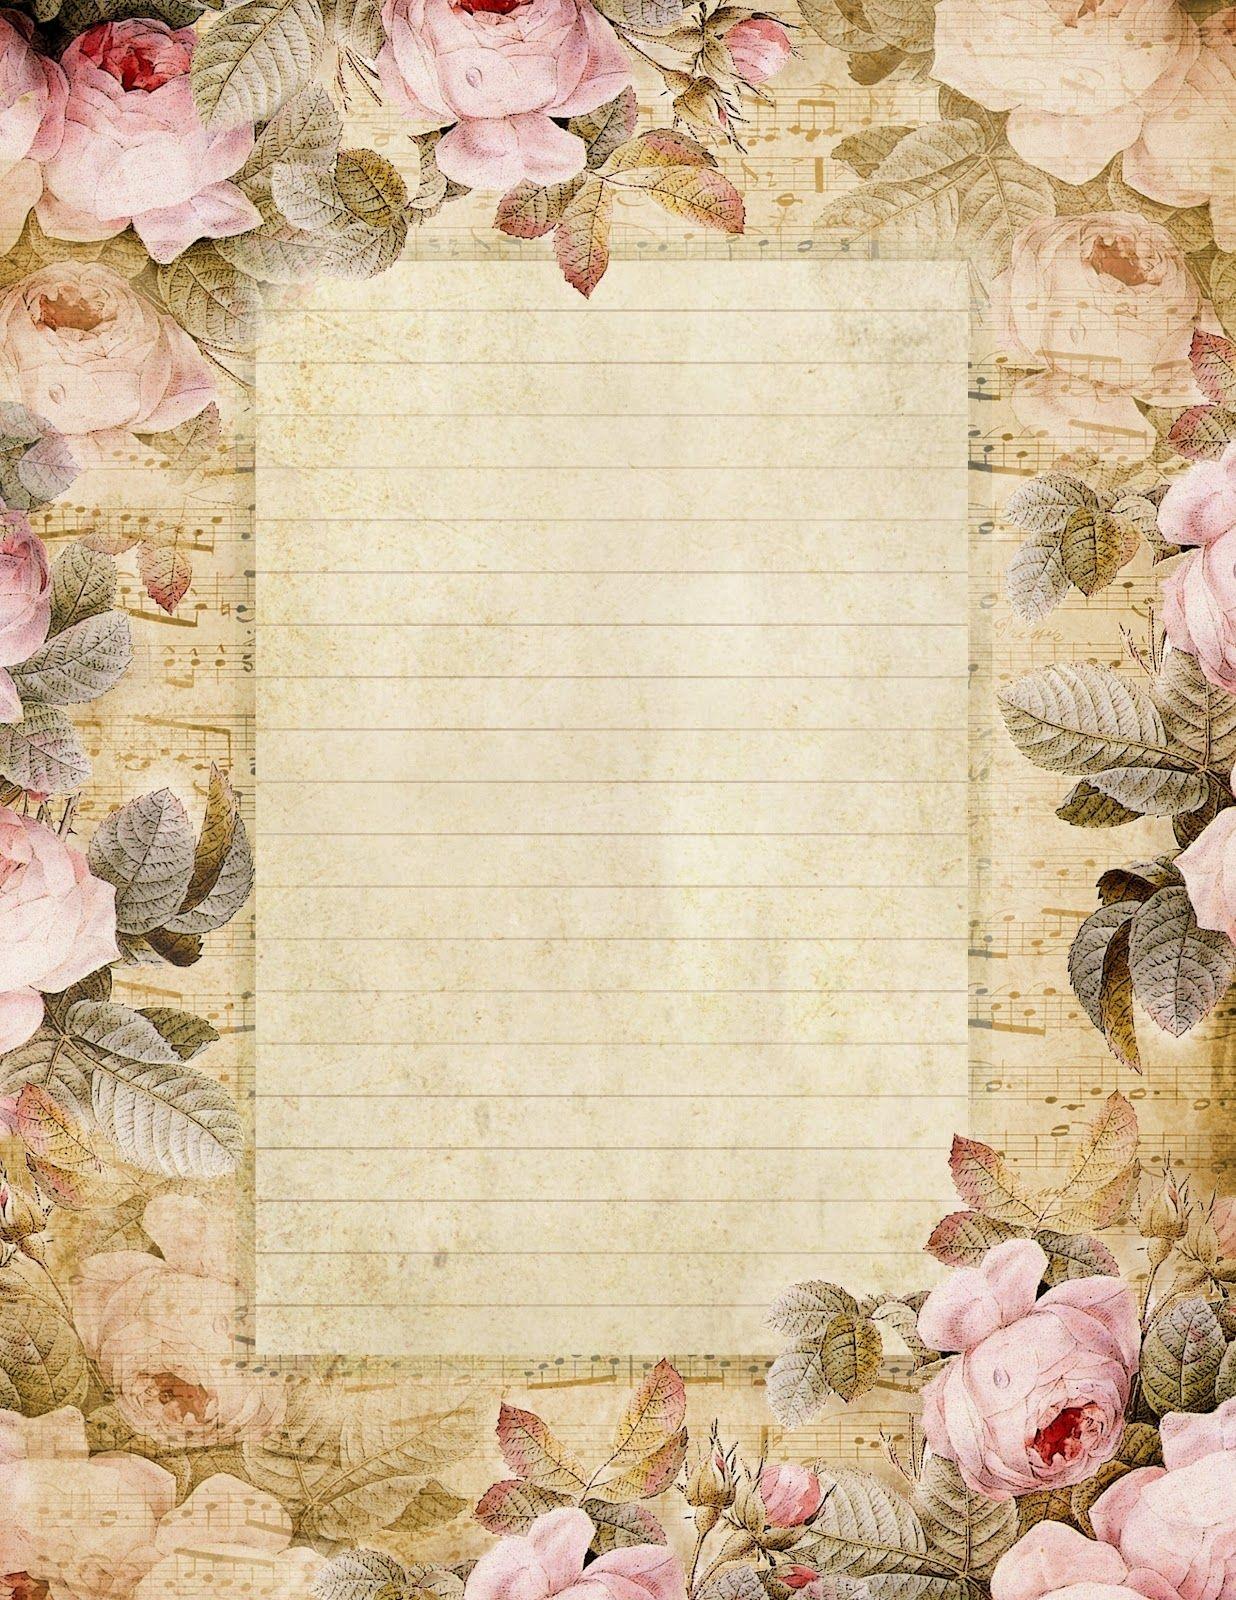 Lilac & Lavender: The Fairest Blossom | Printable Stationery - Free Printable Vintage Stationary